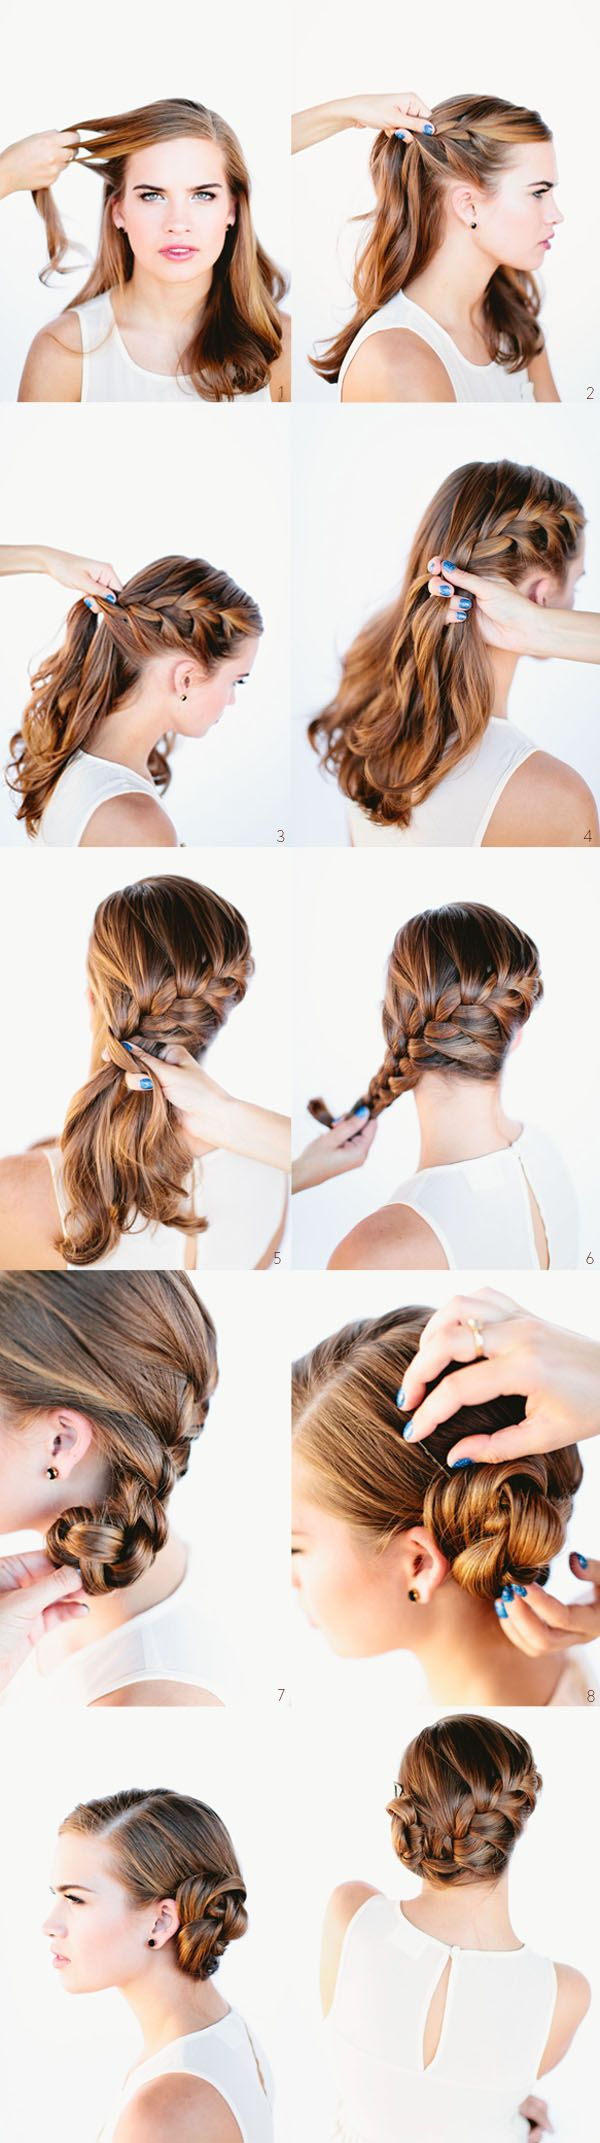 Easy+DIY+Hairstyles+for+Medium+and+Long+Hair1+(2)